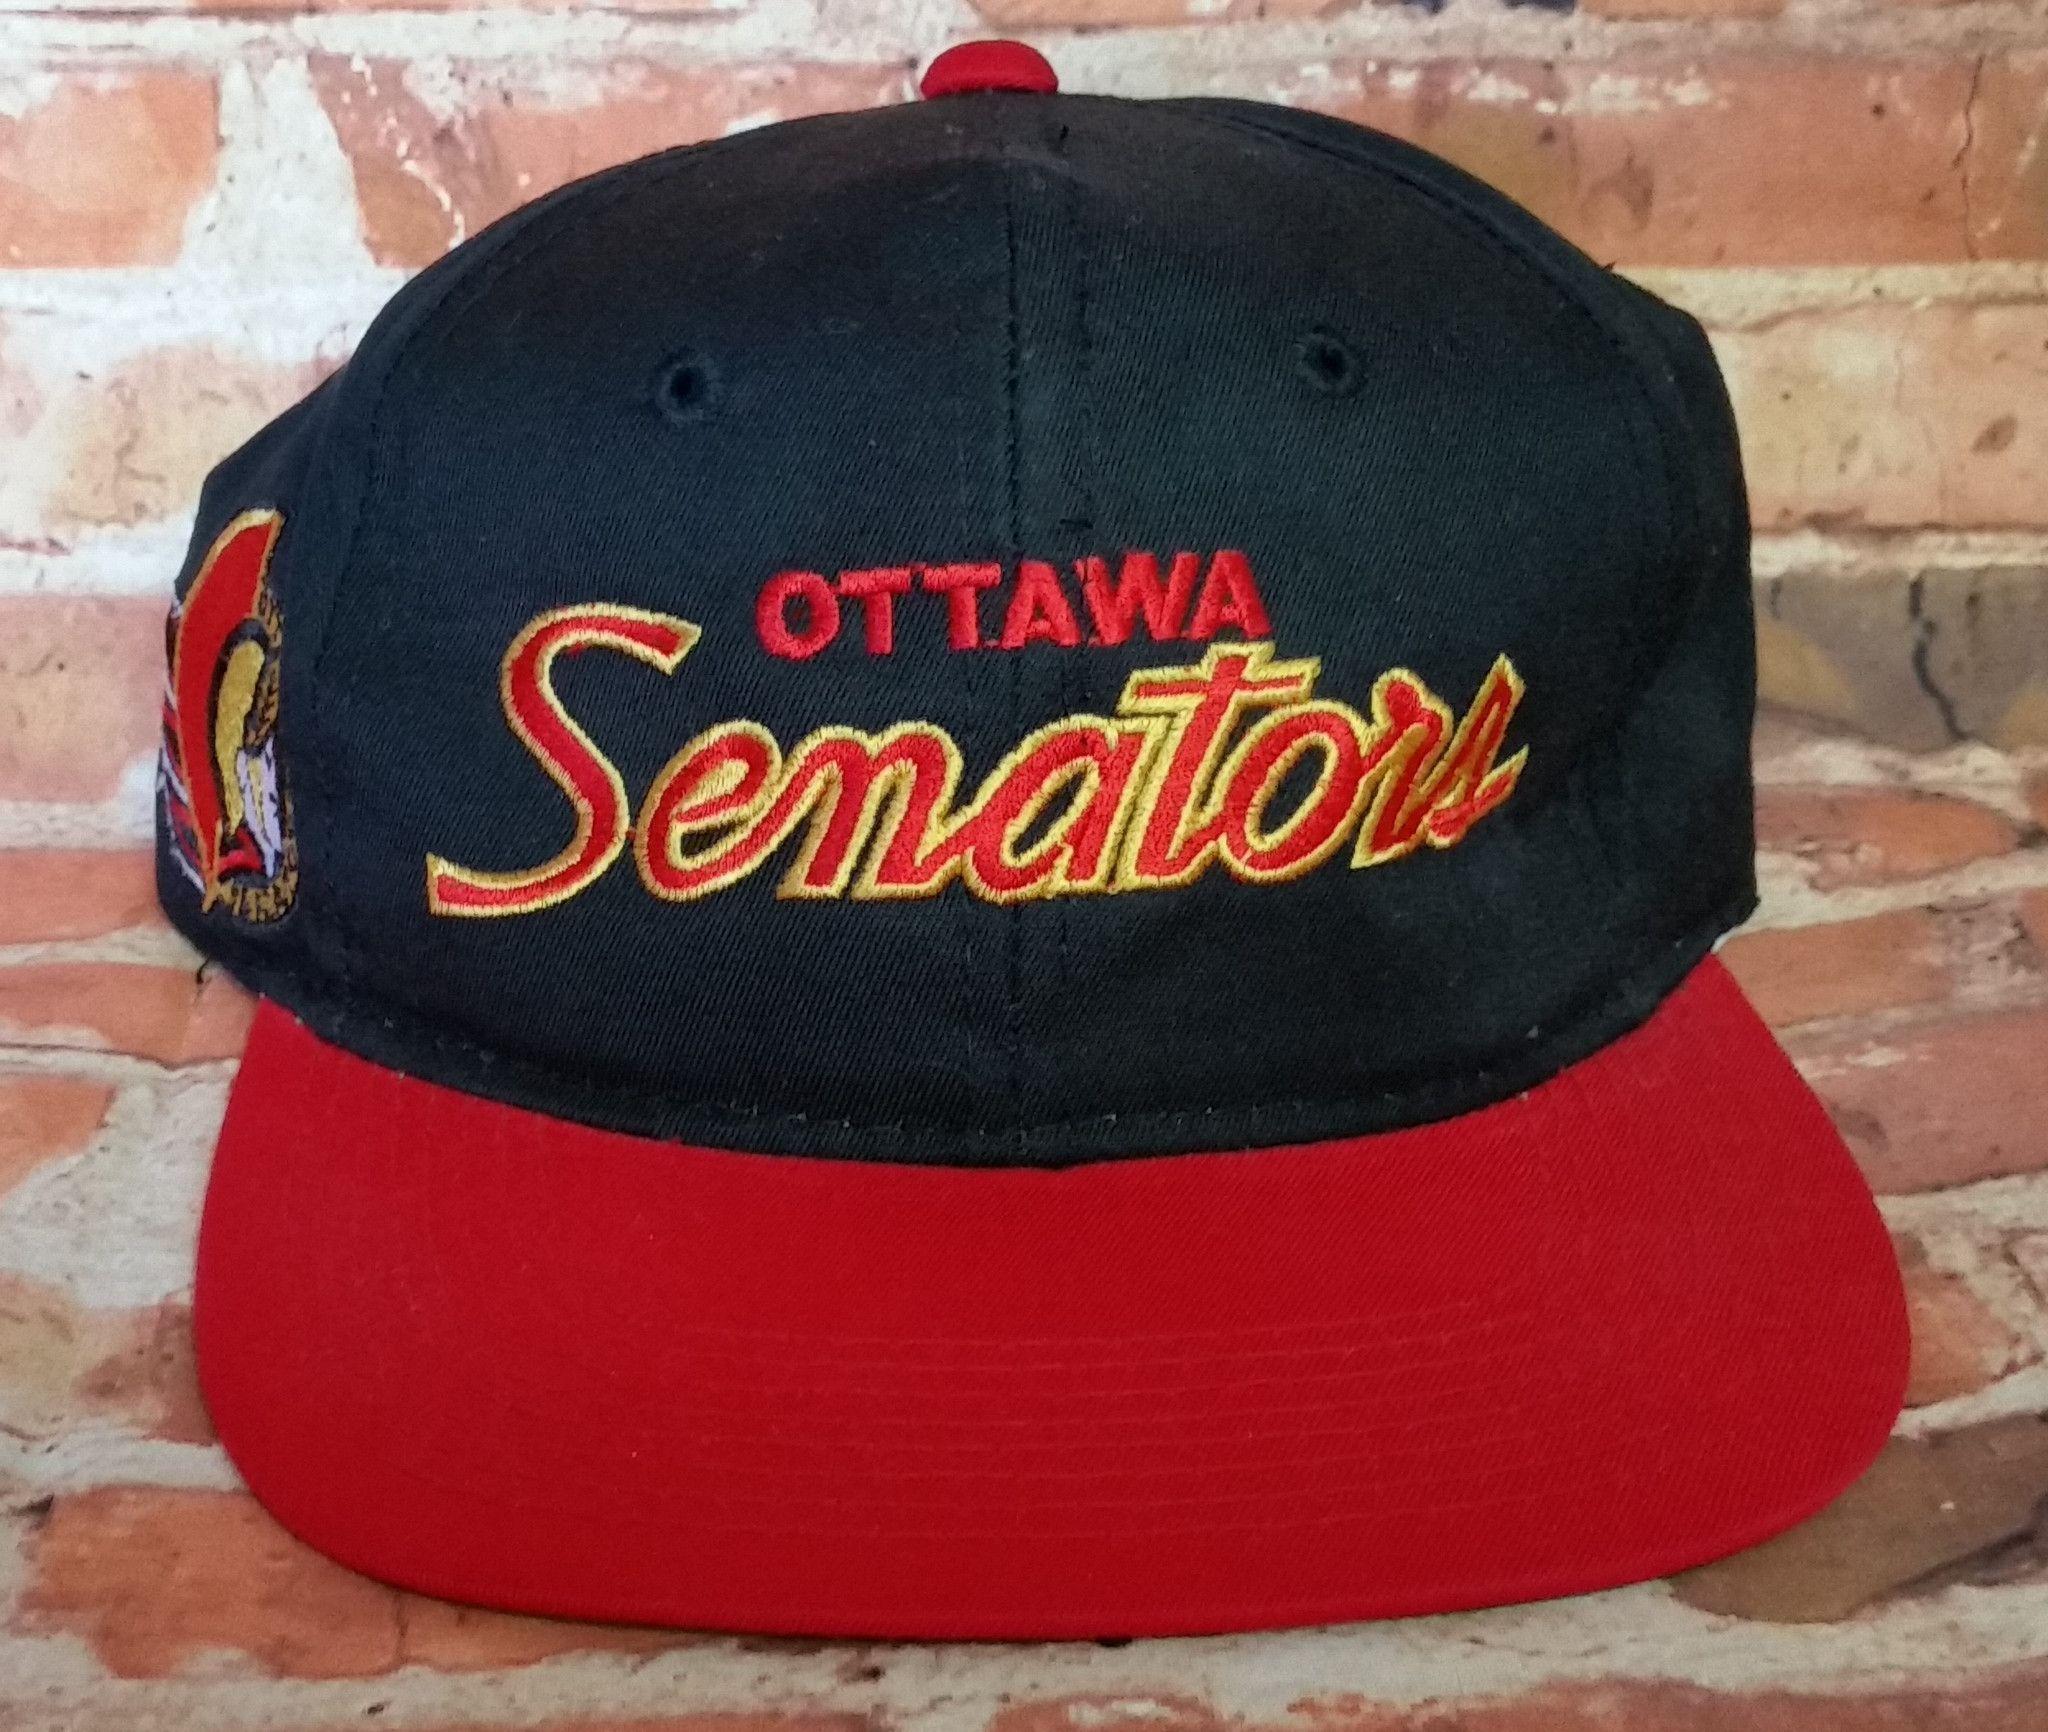 b3344eaac0c5c6 ... czech ottawa senators vintage snapback sports specialties script hat  nhl cap rare nhl cap snapback hats